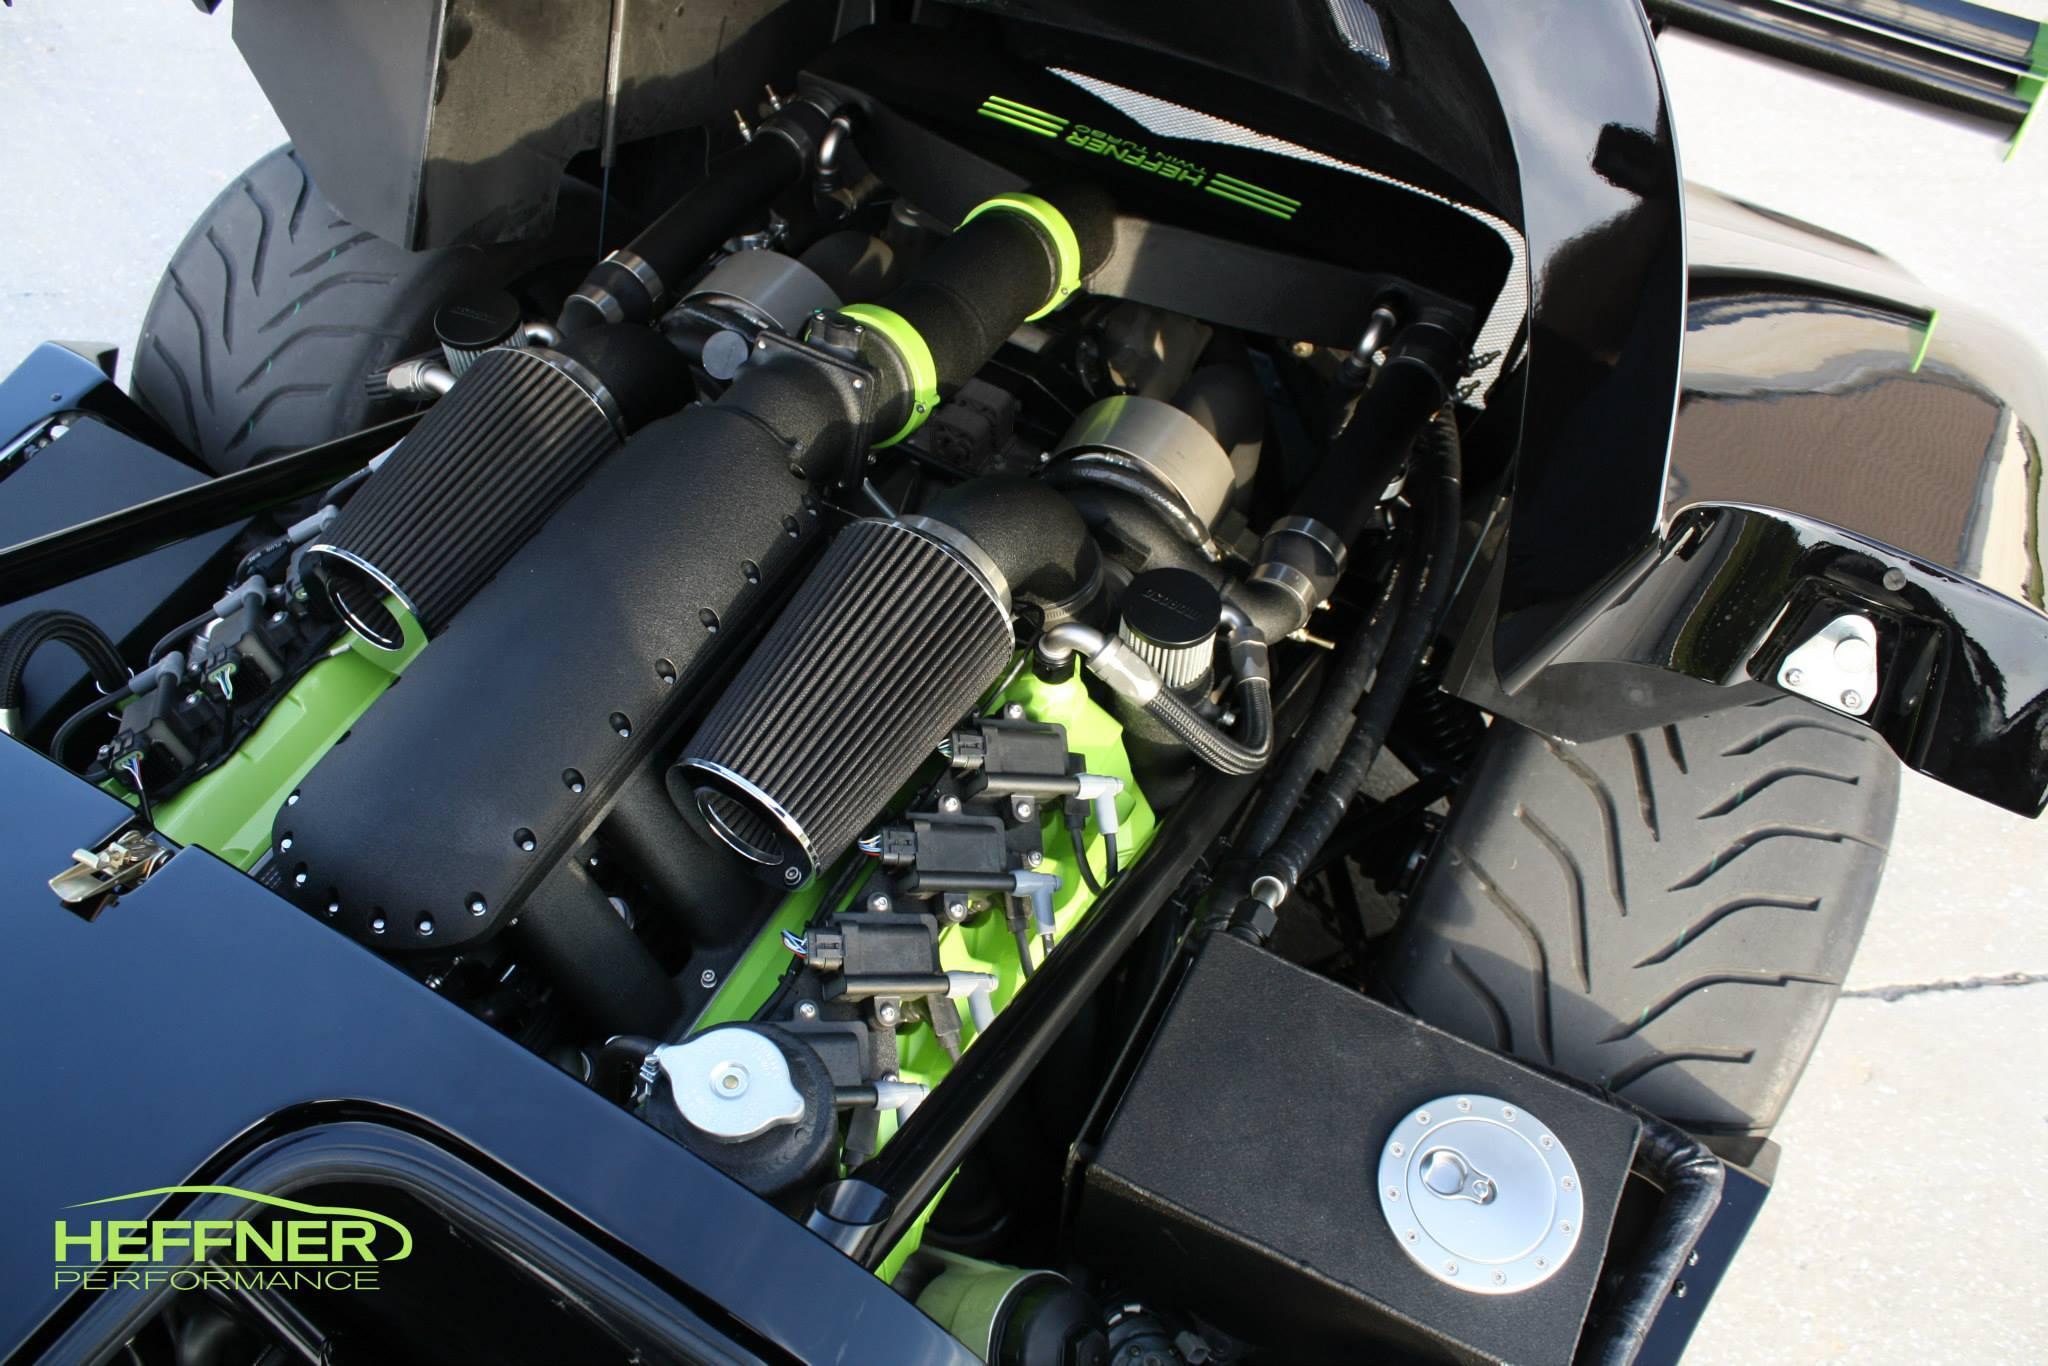 1000 Hp Honda Odyssey >> Heffner Performance Twin Turbo Ultima GTR Has 1000 RWHP - autoevolution